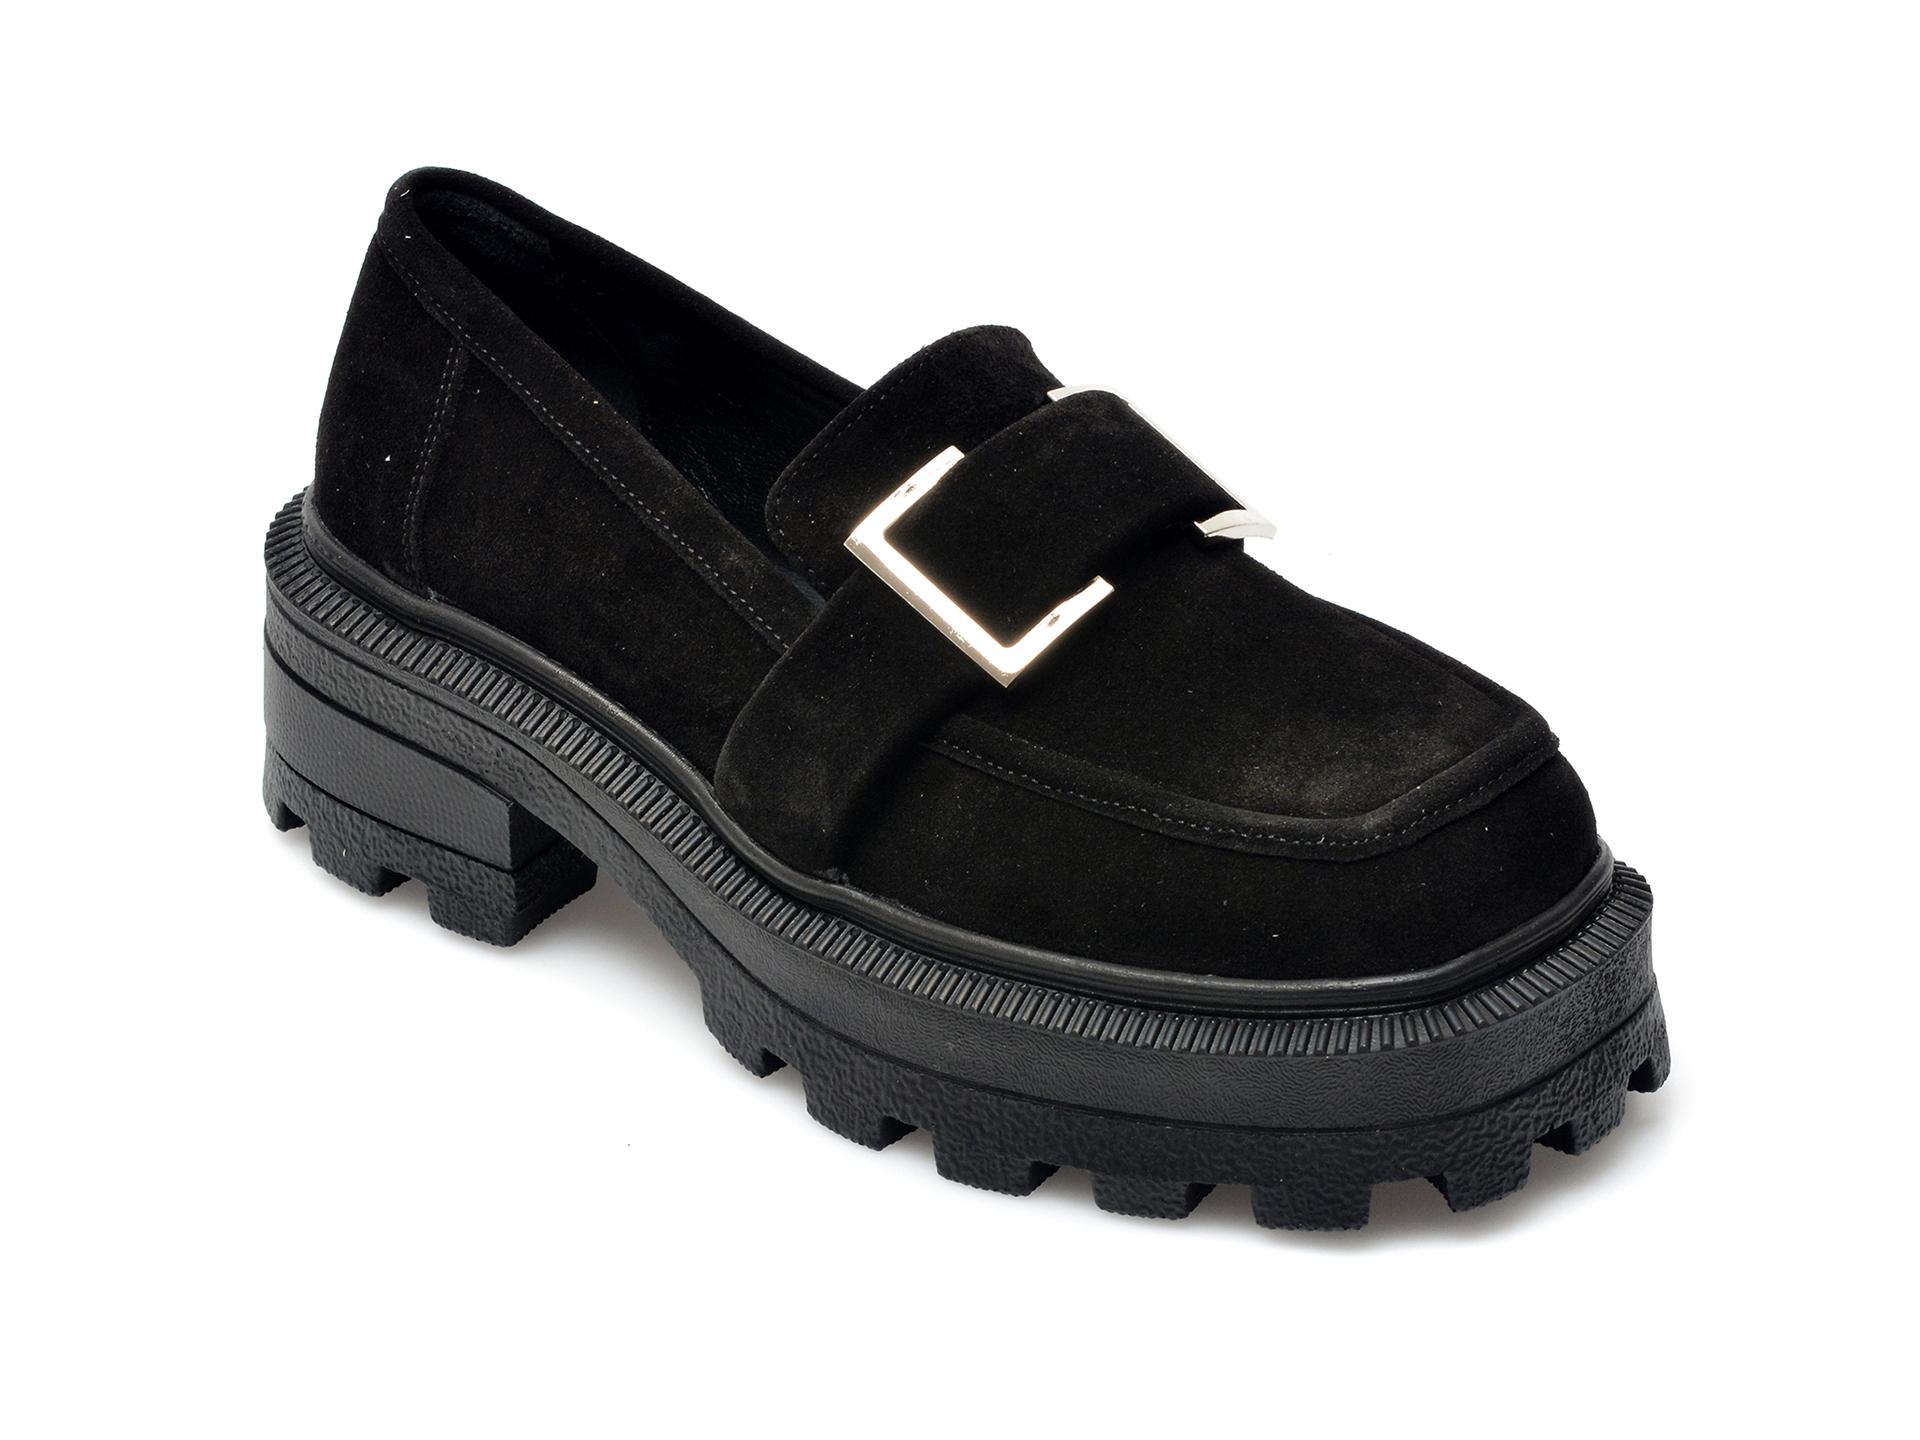 Pantofi EPICA negri, 21748, din piele intoarsa imagine otter.ro 2021